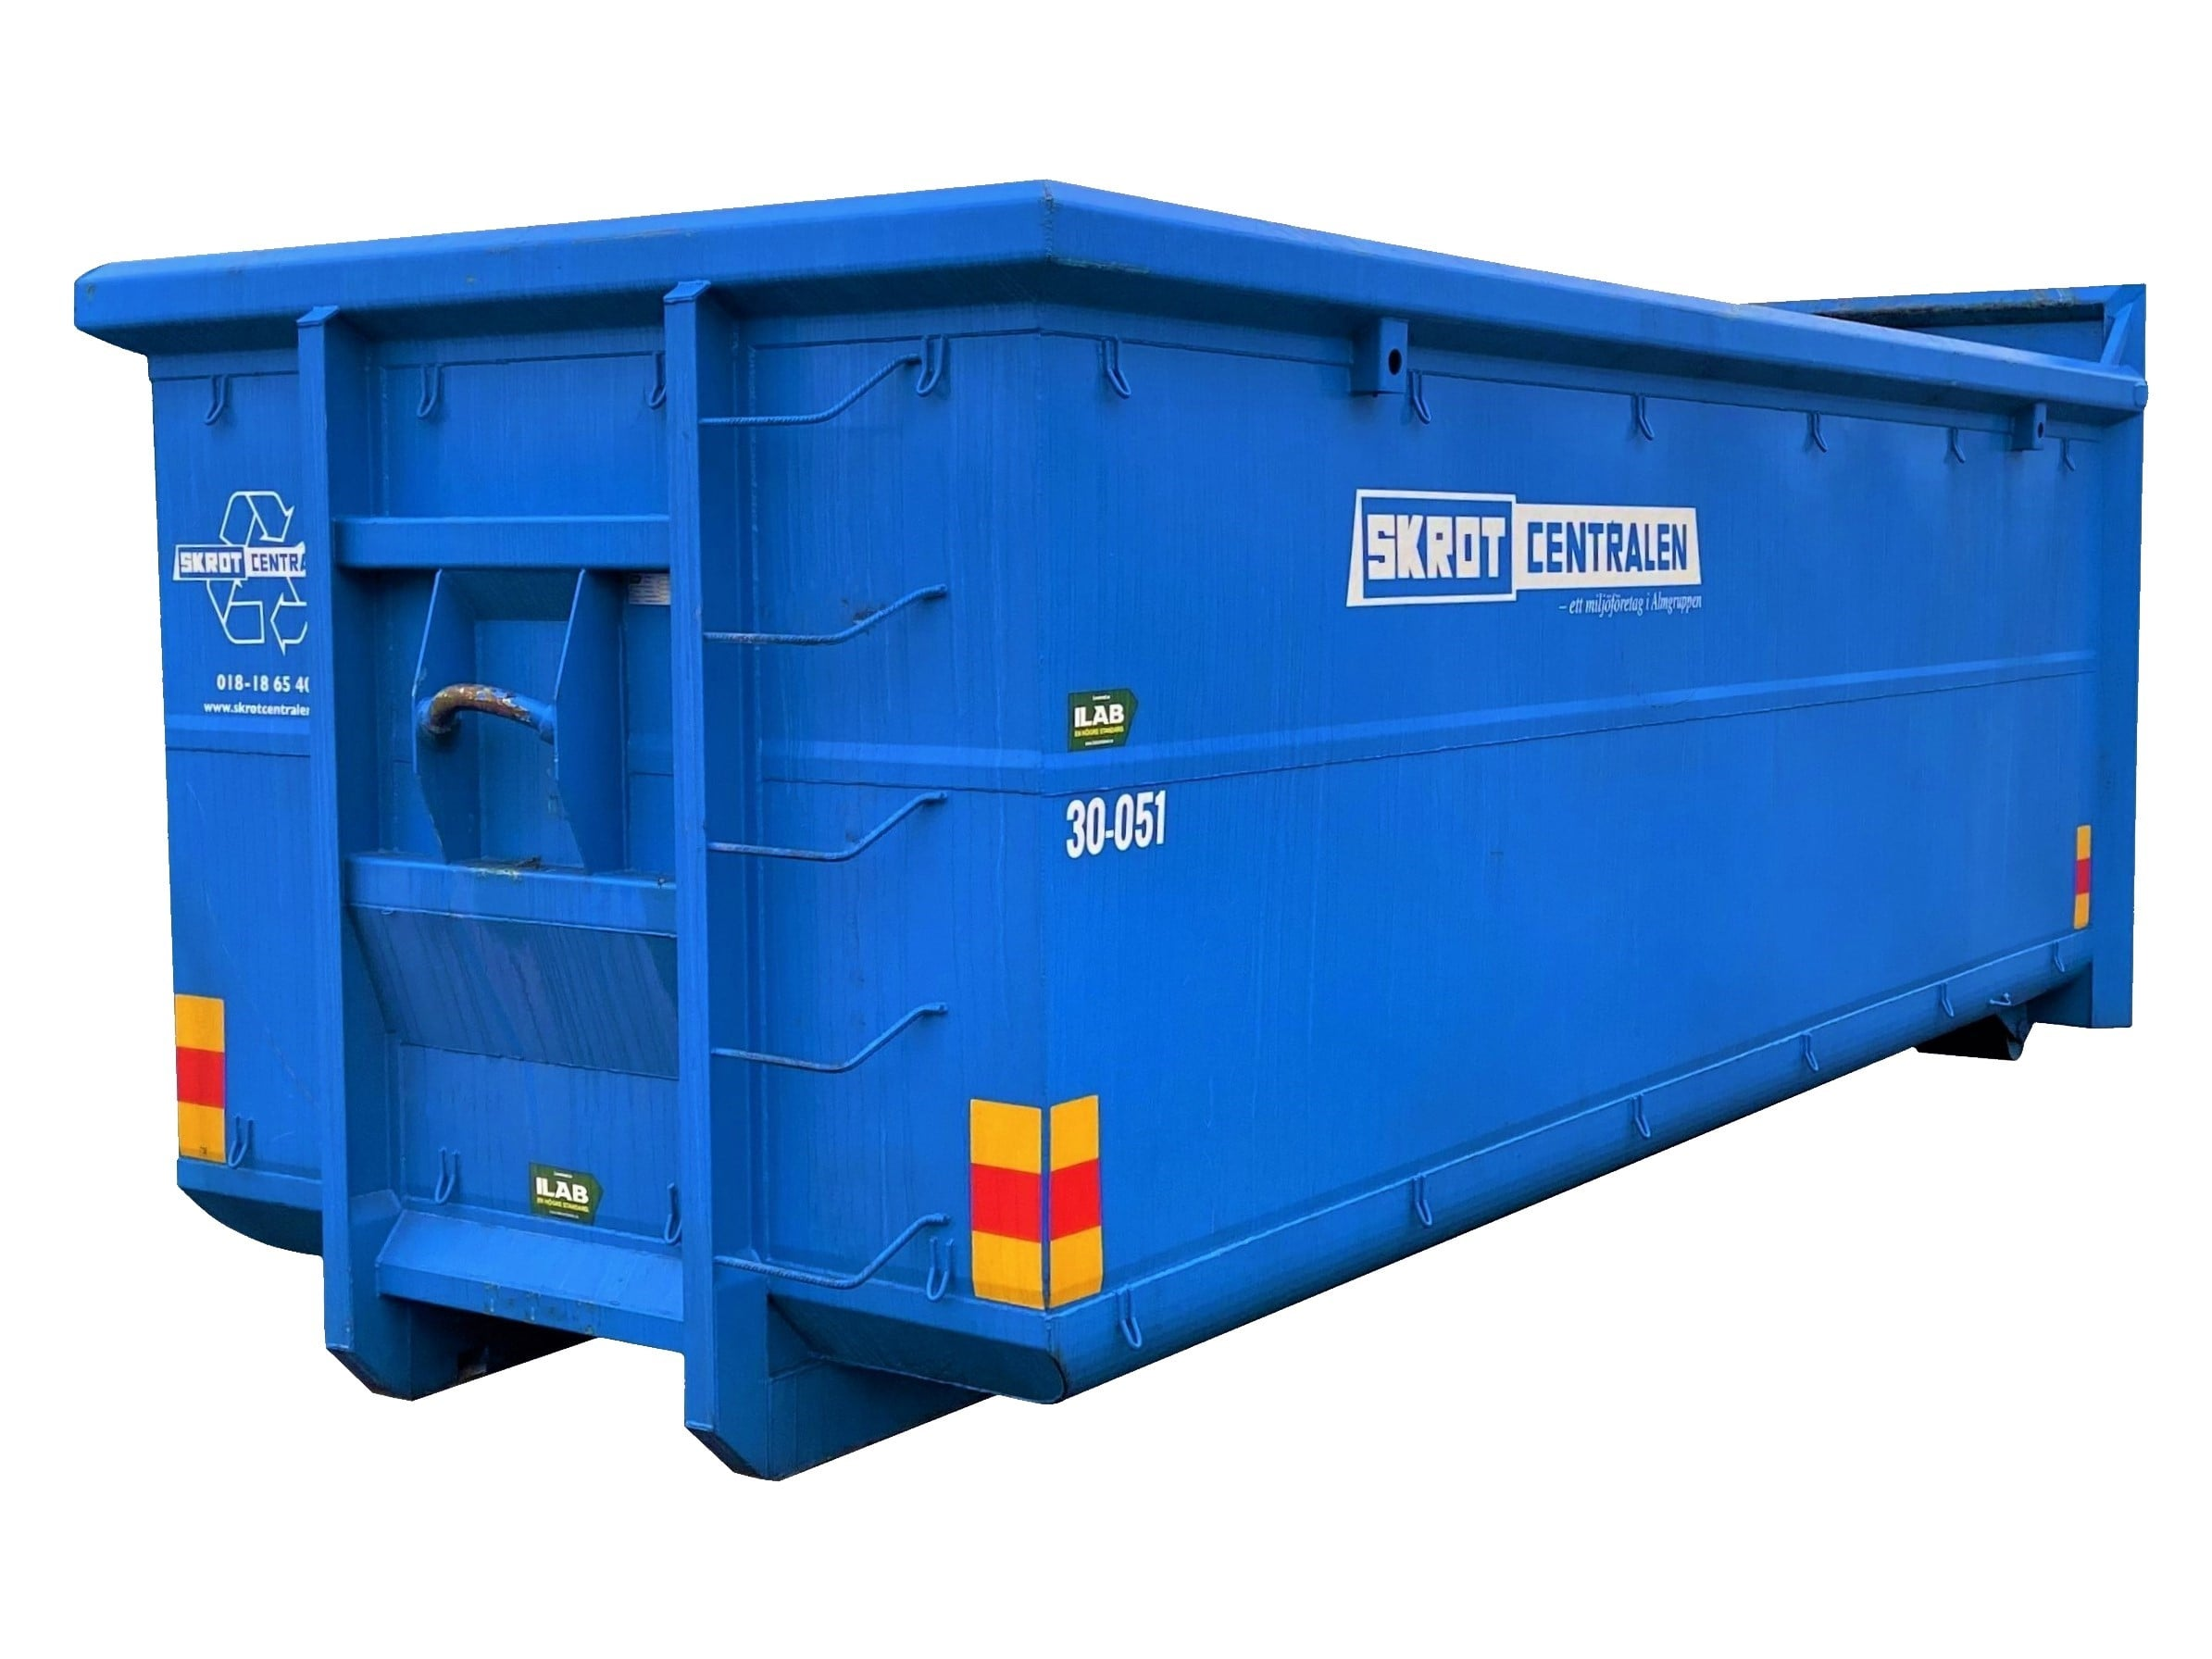 hyra container uppsala